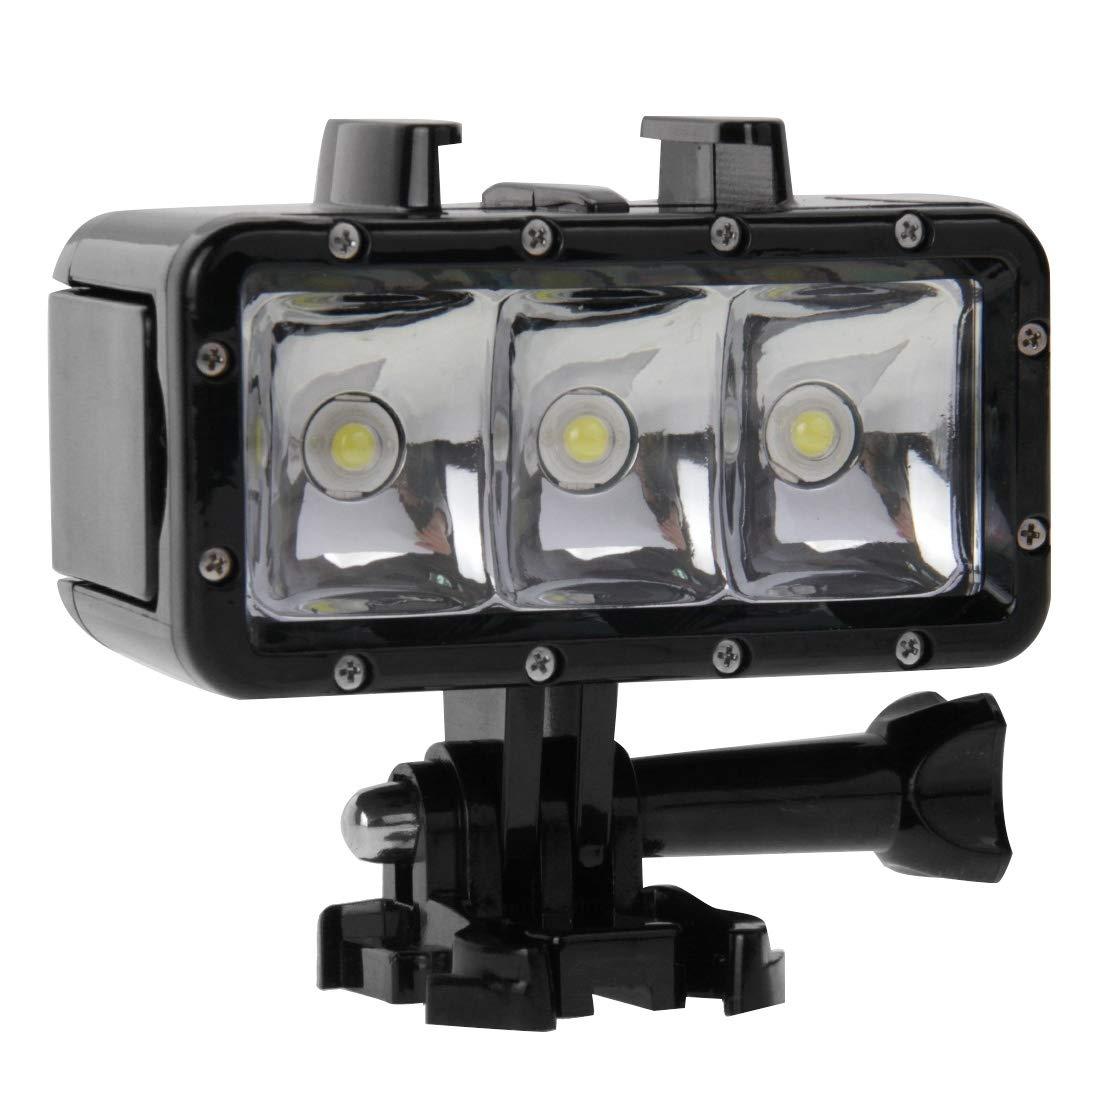 30m防水ビデオライト GoPro用 3モード懐中電灯 ベースマウント&ねじ付き Hero /HERO6 /5/5 セッション /4 セッション /4/3+ /3/2 /1 Xiaoyiおよびその他のアクションカメラ用   B07PNC8NKN